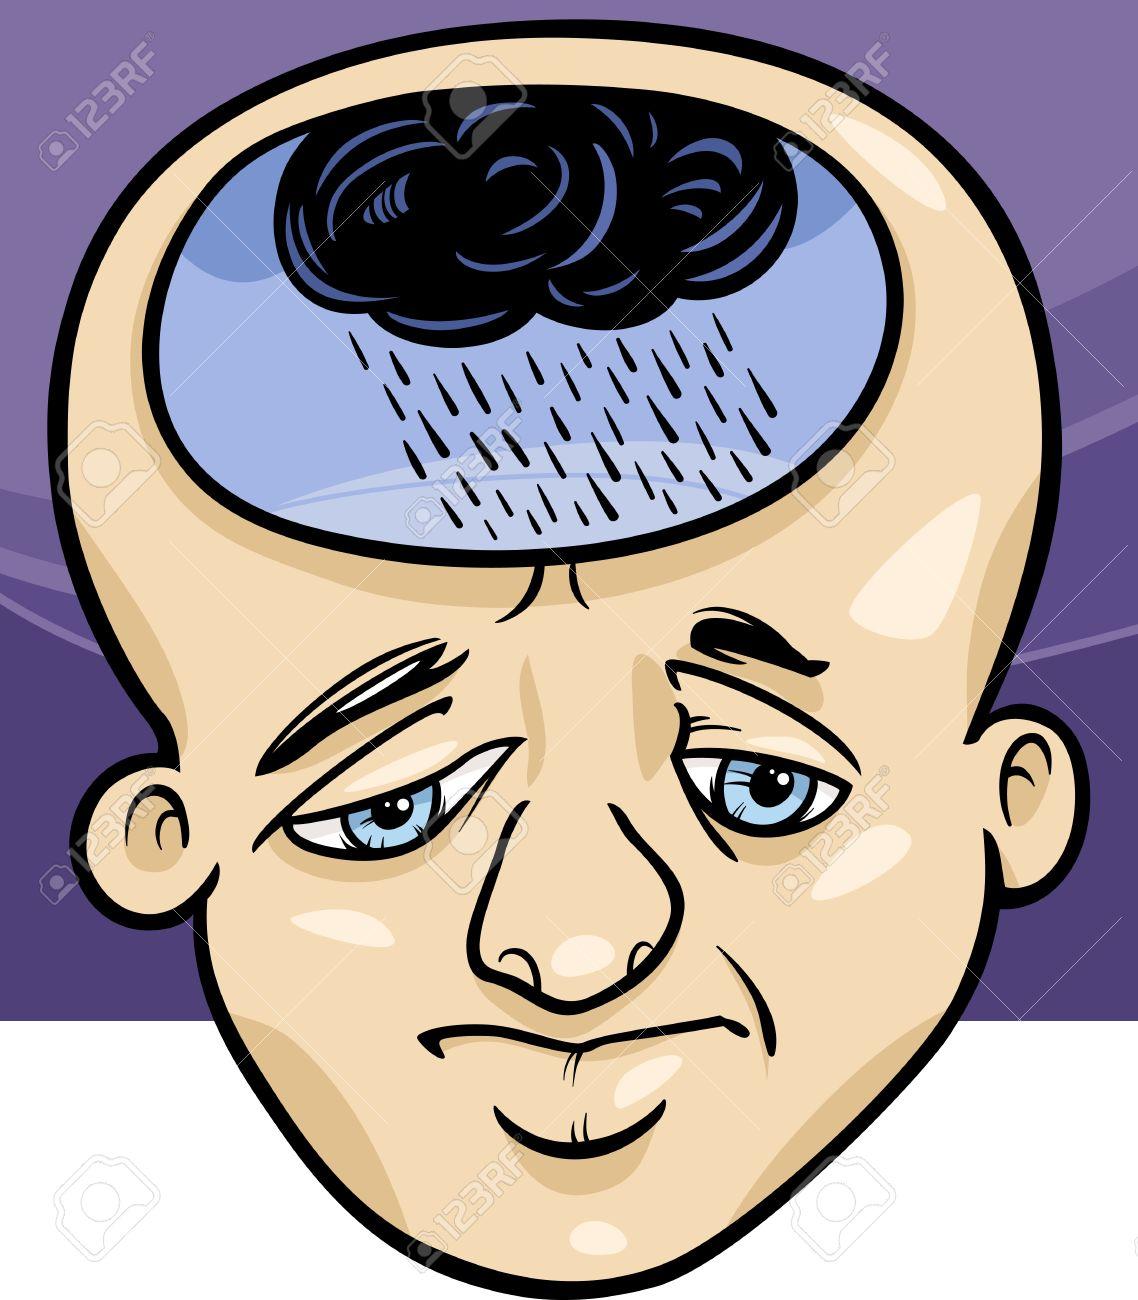 Image result for depression cartoon